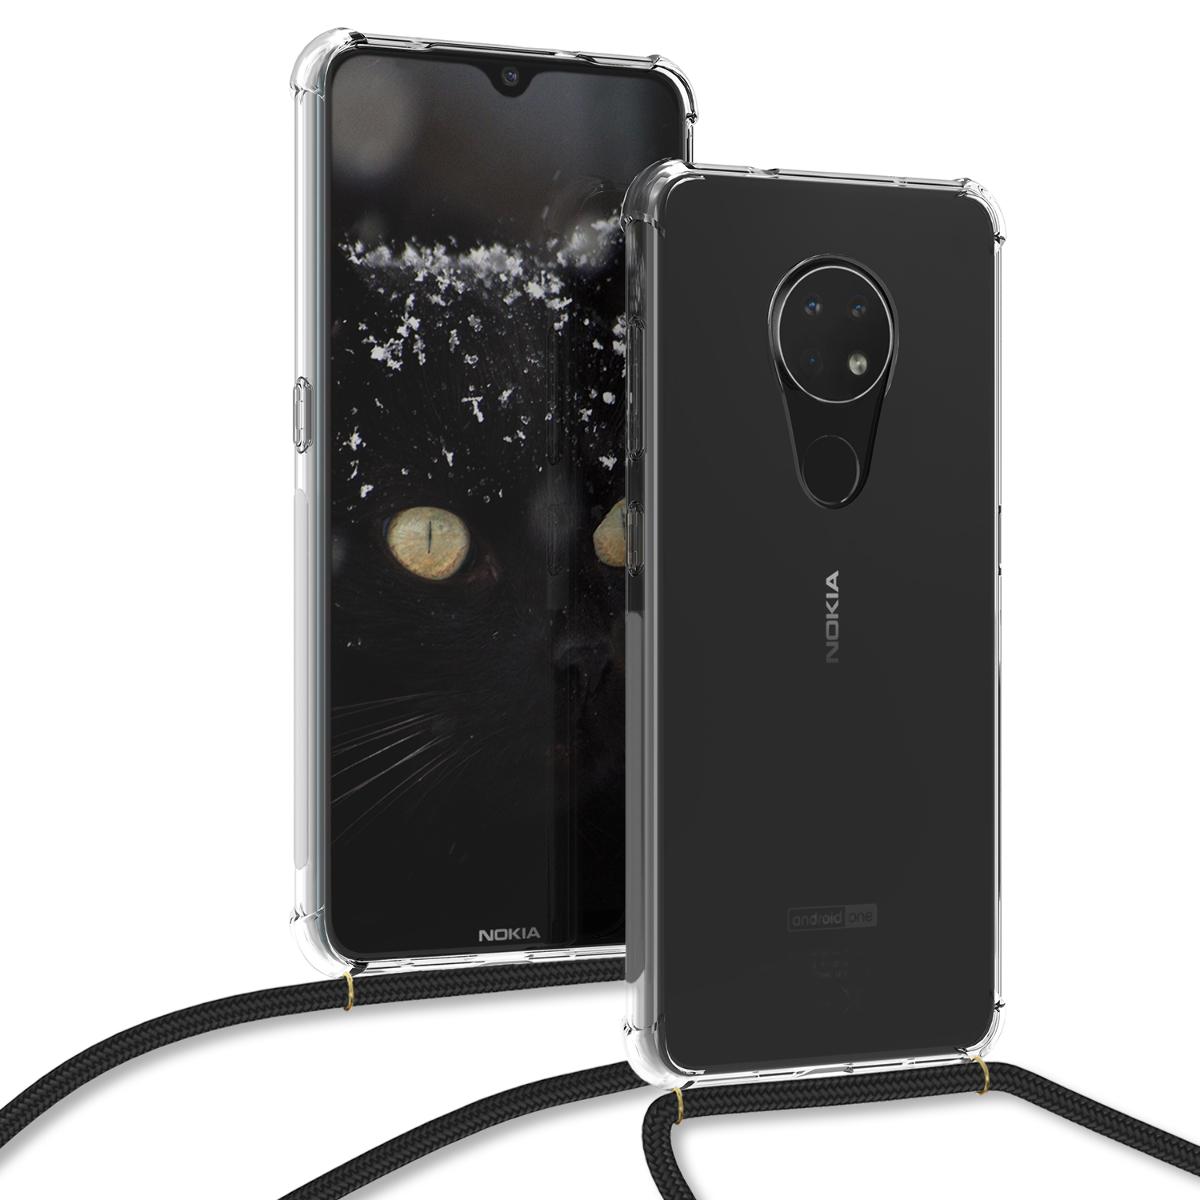 KW Θήκη Σιλικόνης με Λουράκι Λαιμού Nokia 6.2 - Transparent (51097.03)